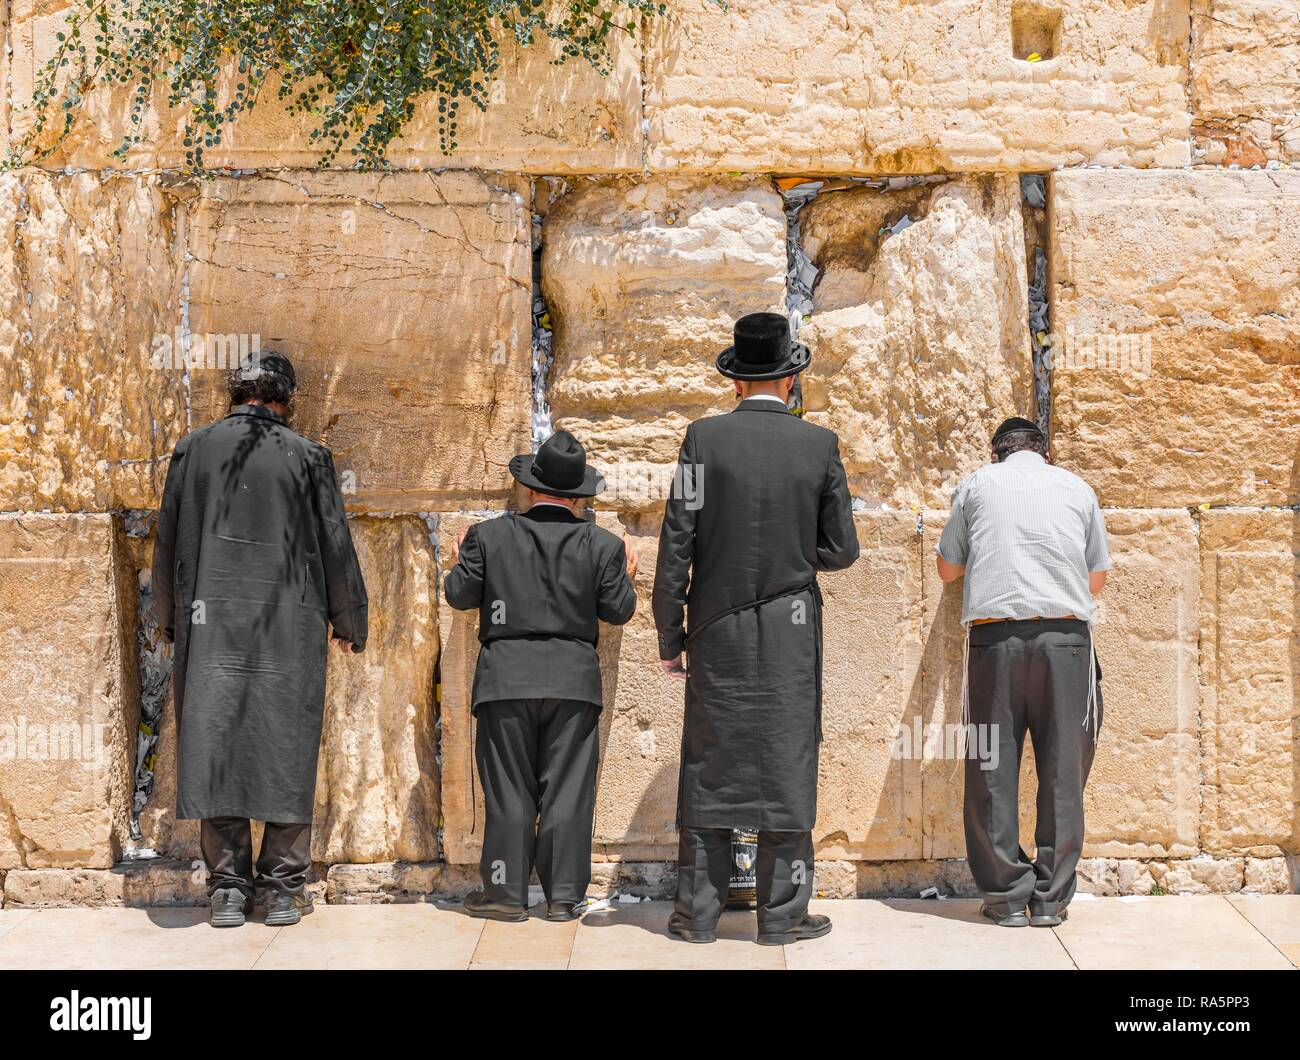 Praying Orthodox Jews at the Wailing Wall, Jerusalem, Israel - Stock Image